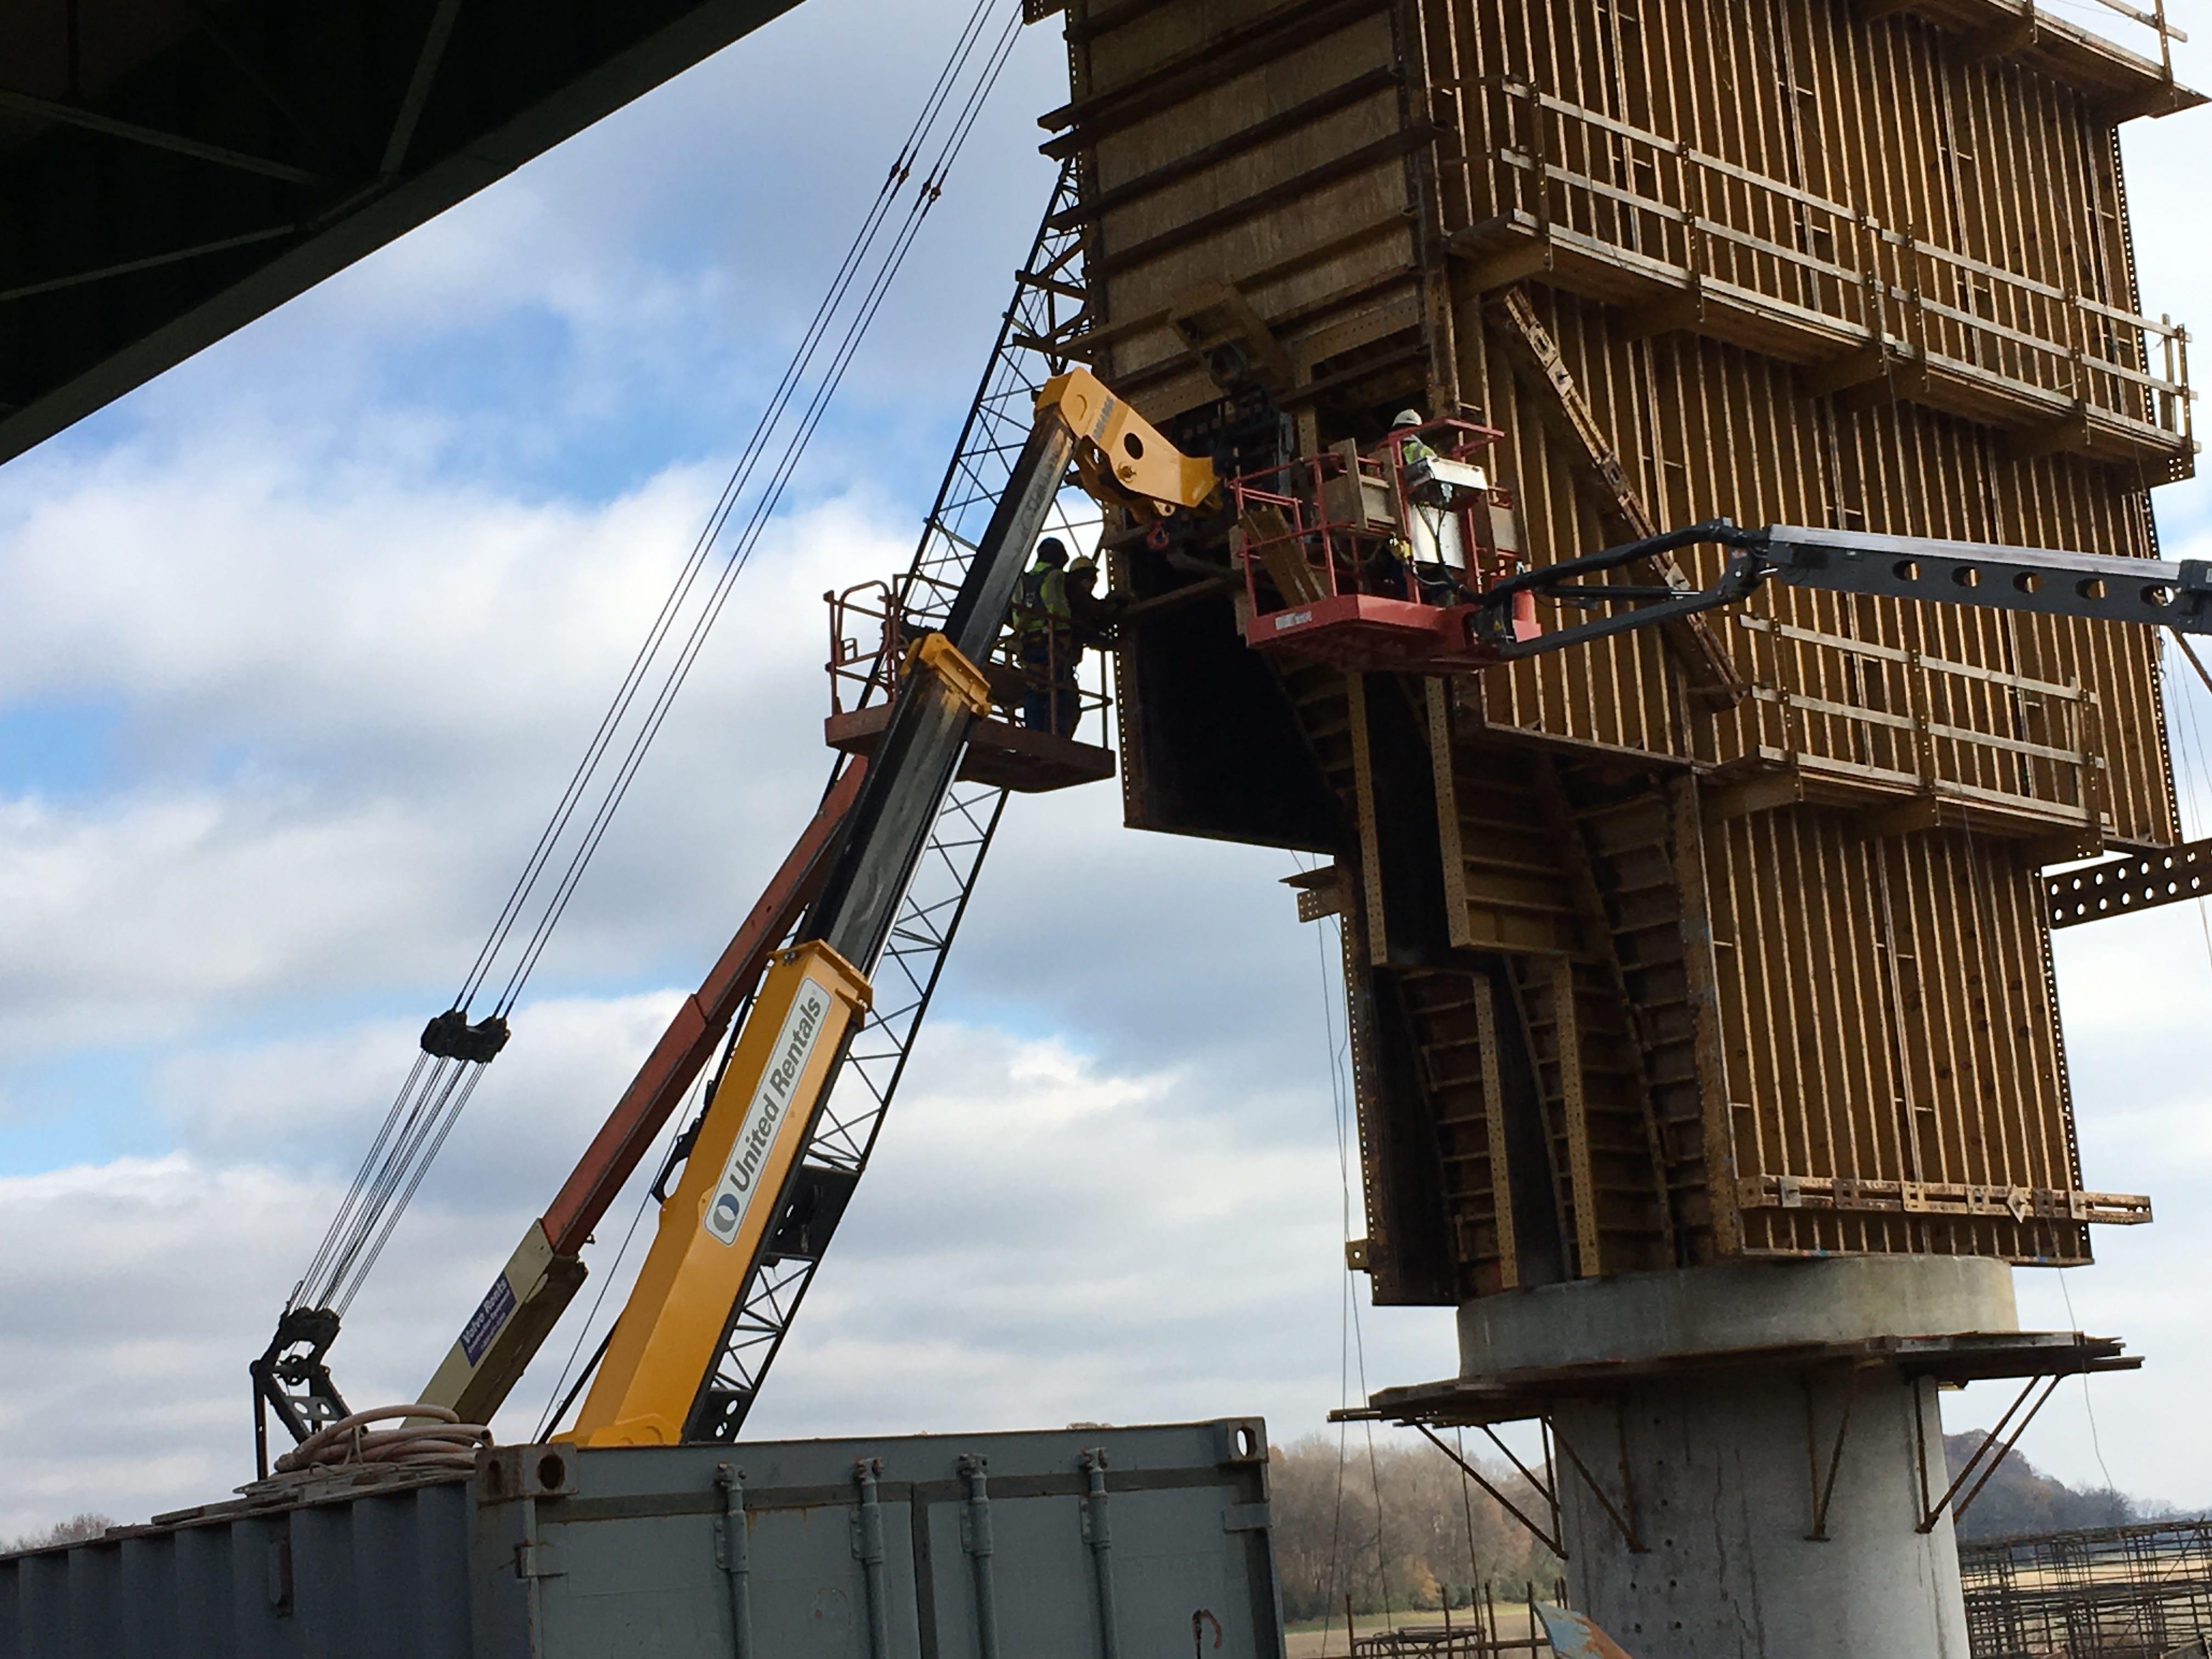 Workers detach a concrete form around a bridge support pier.